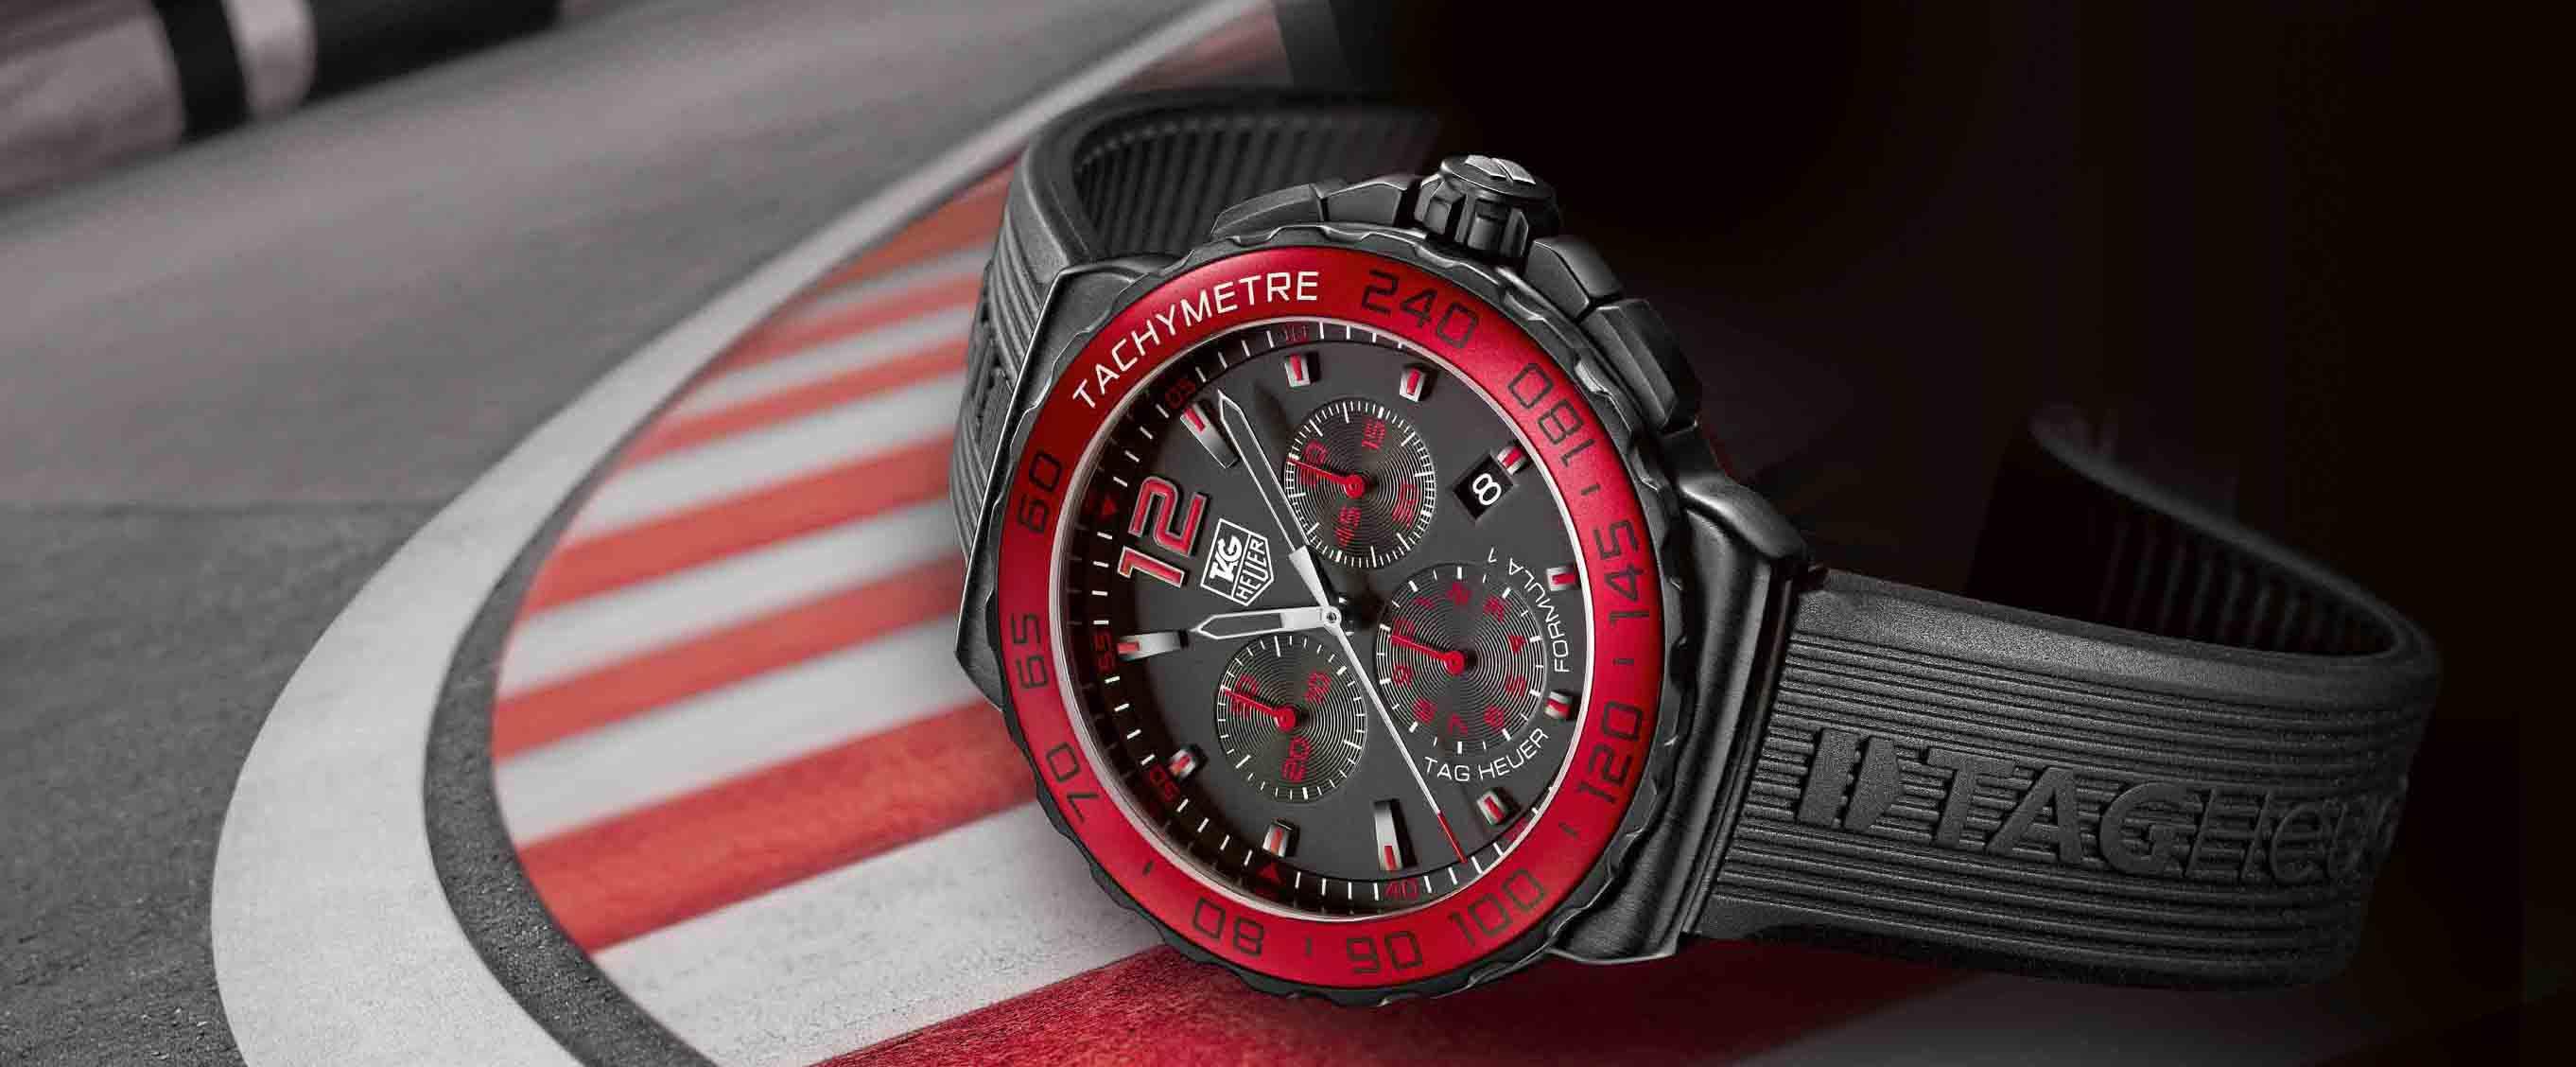 Tag Heuer Formula 1 Replica Watch